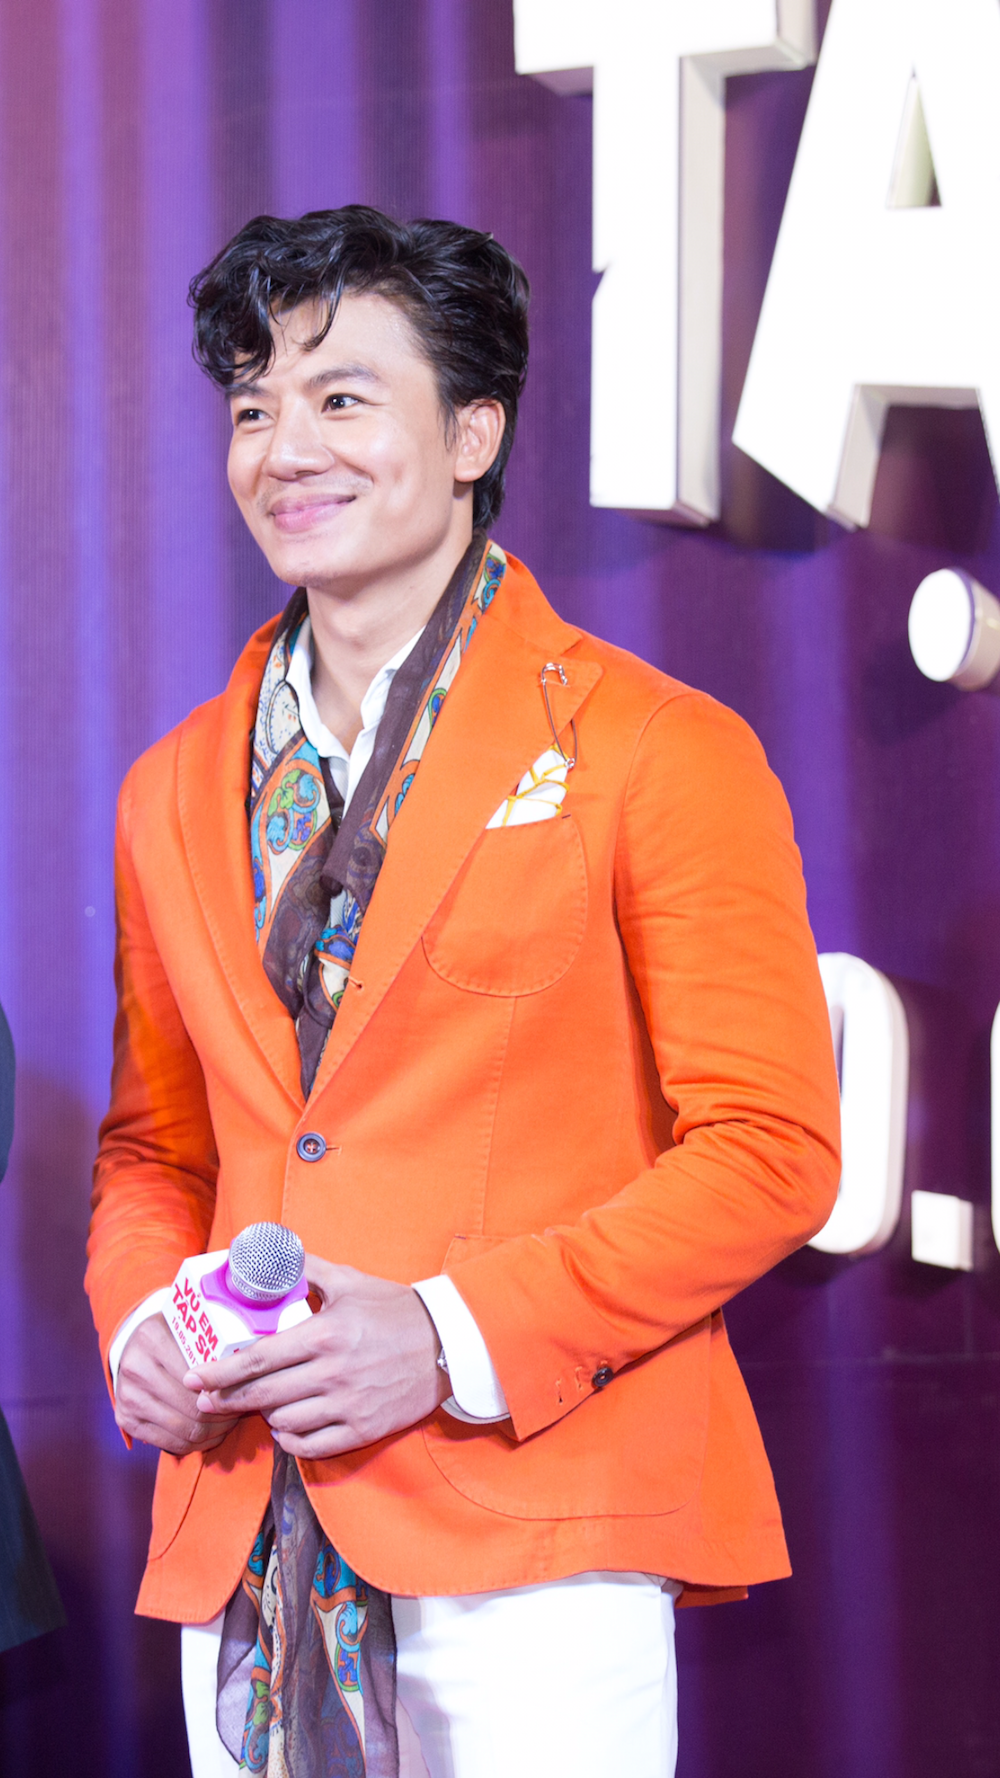 Hieu Nguyen bat ngo thay doi phong cach voi vest cam noi bat hinh anh 2